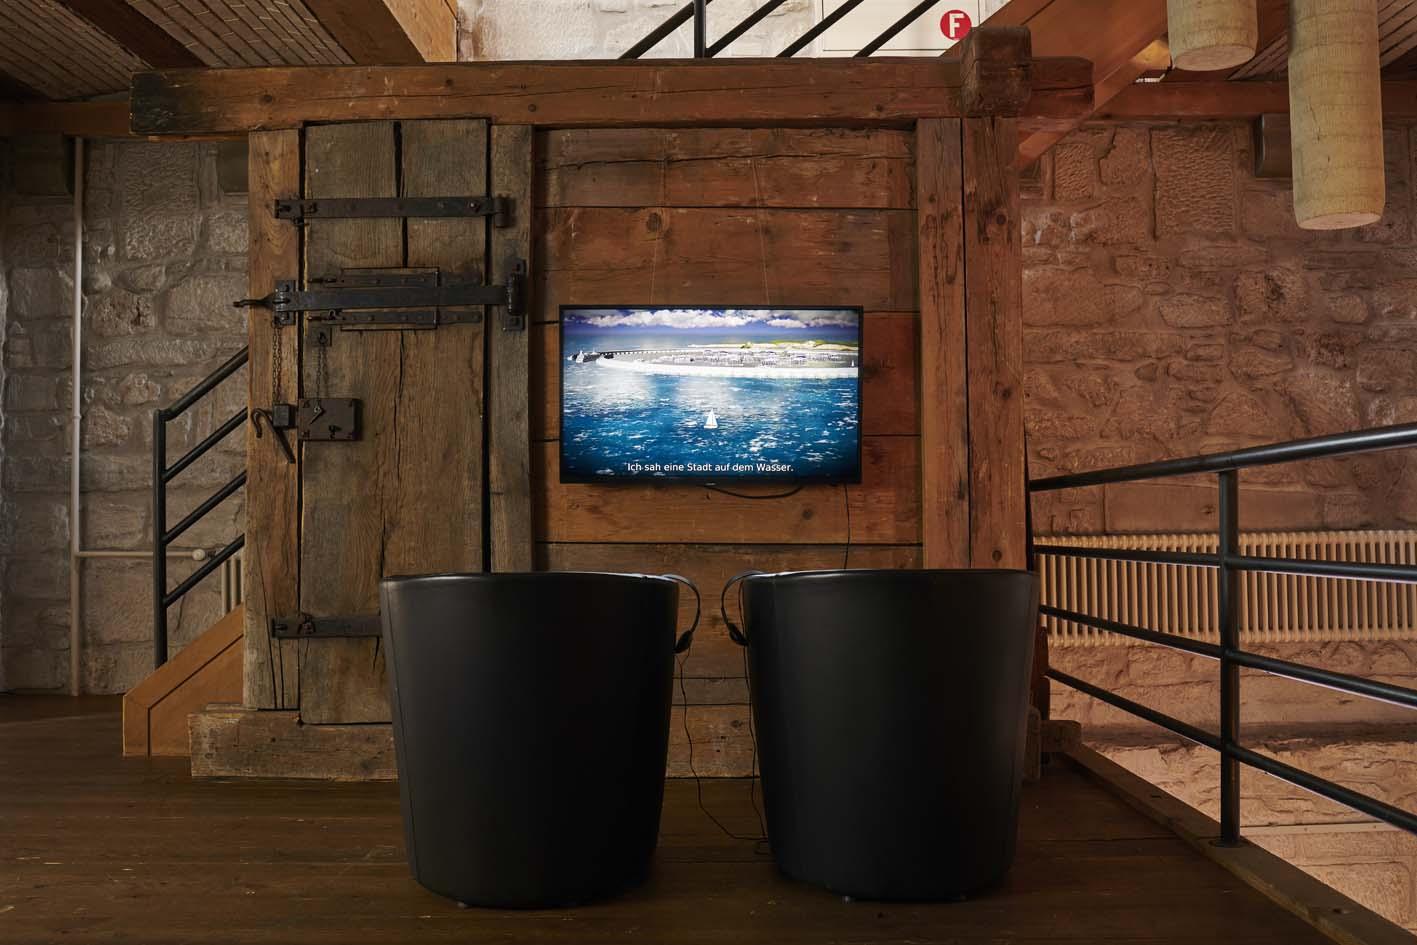 Jacob Hurwitz-Goodman & Daniel Keller,  The Seasteaders , 2018, HD Video, 27 min, Courtesy the artists, Foto: Dominique Uldry